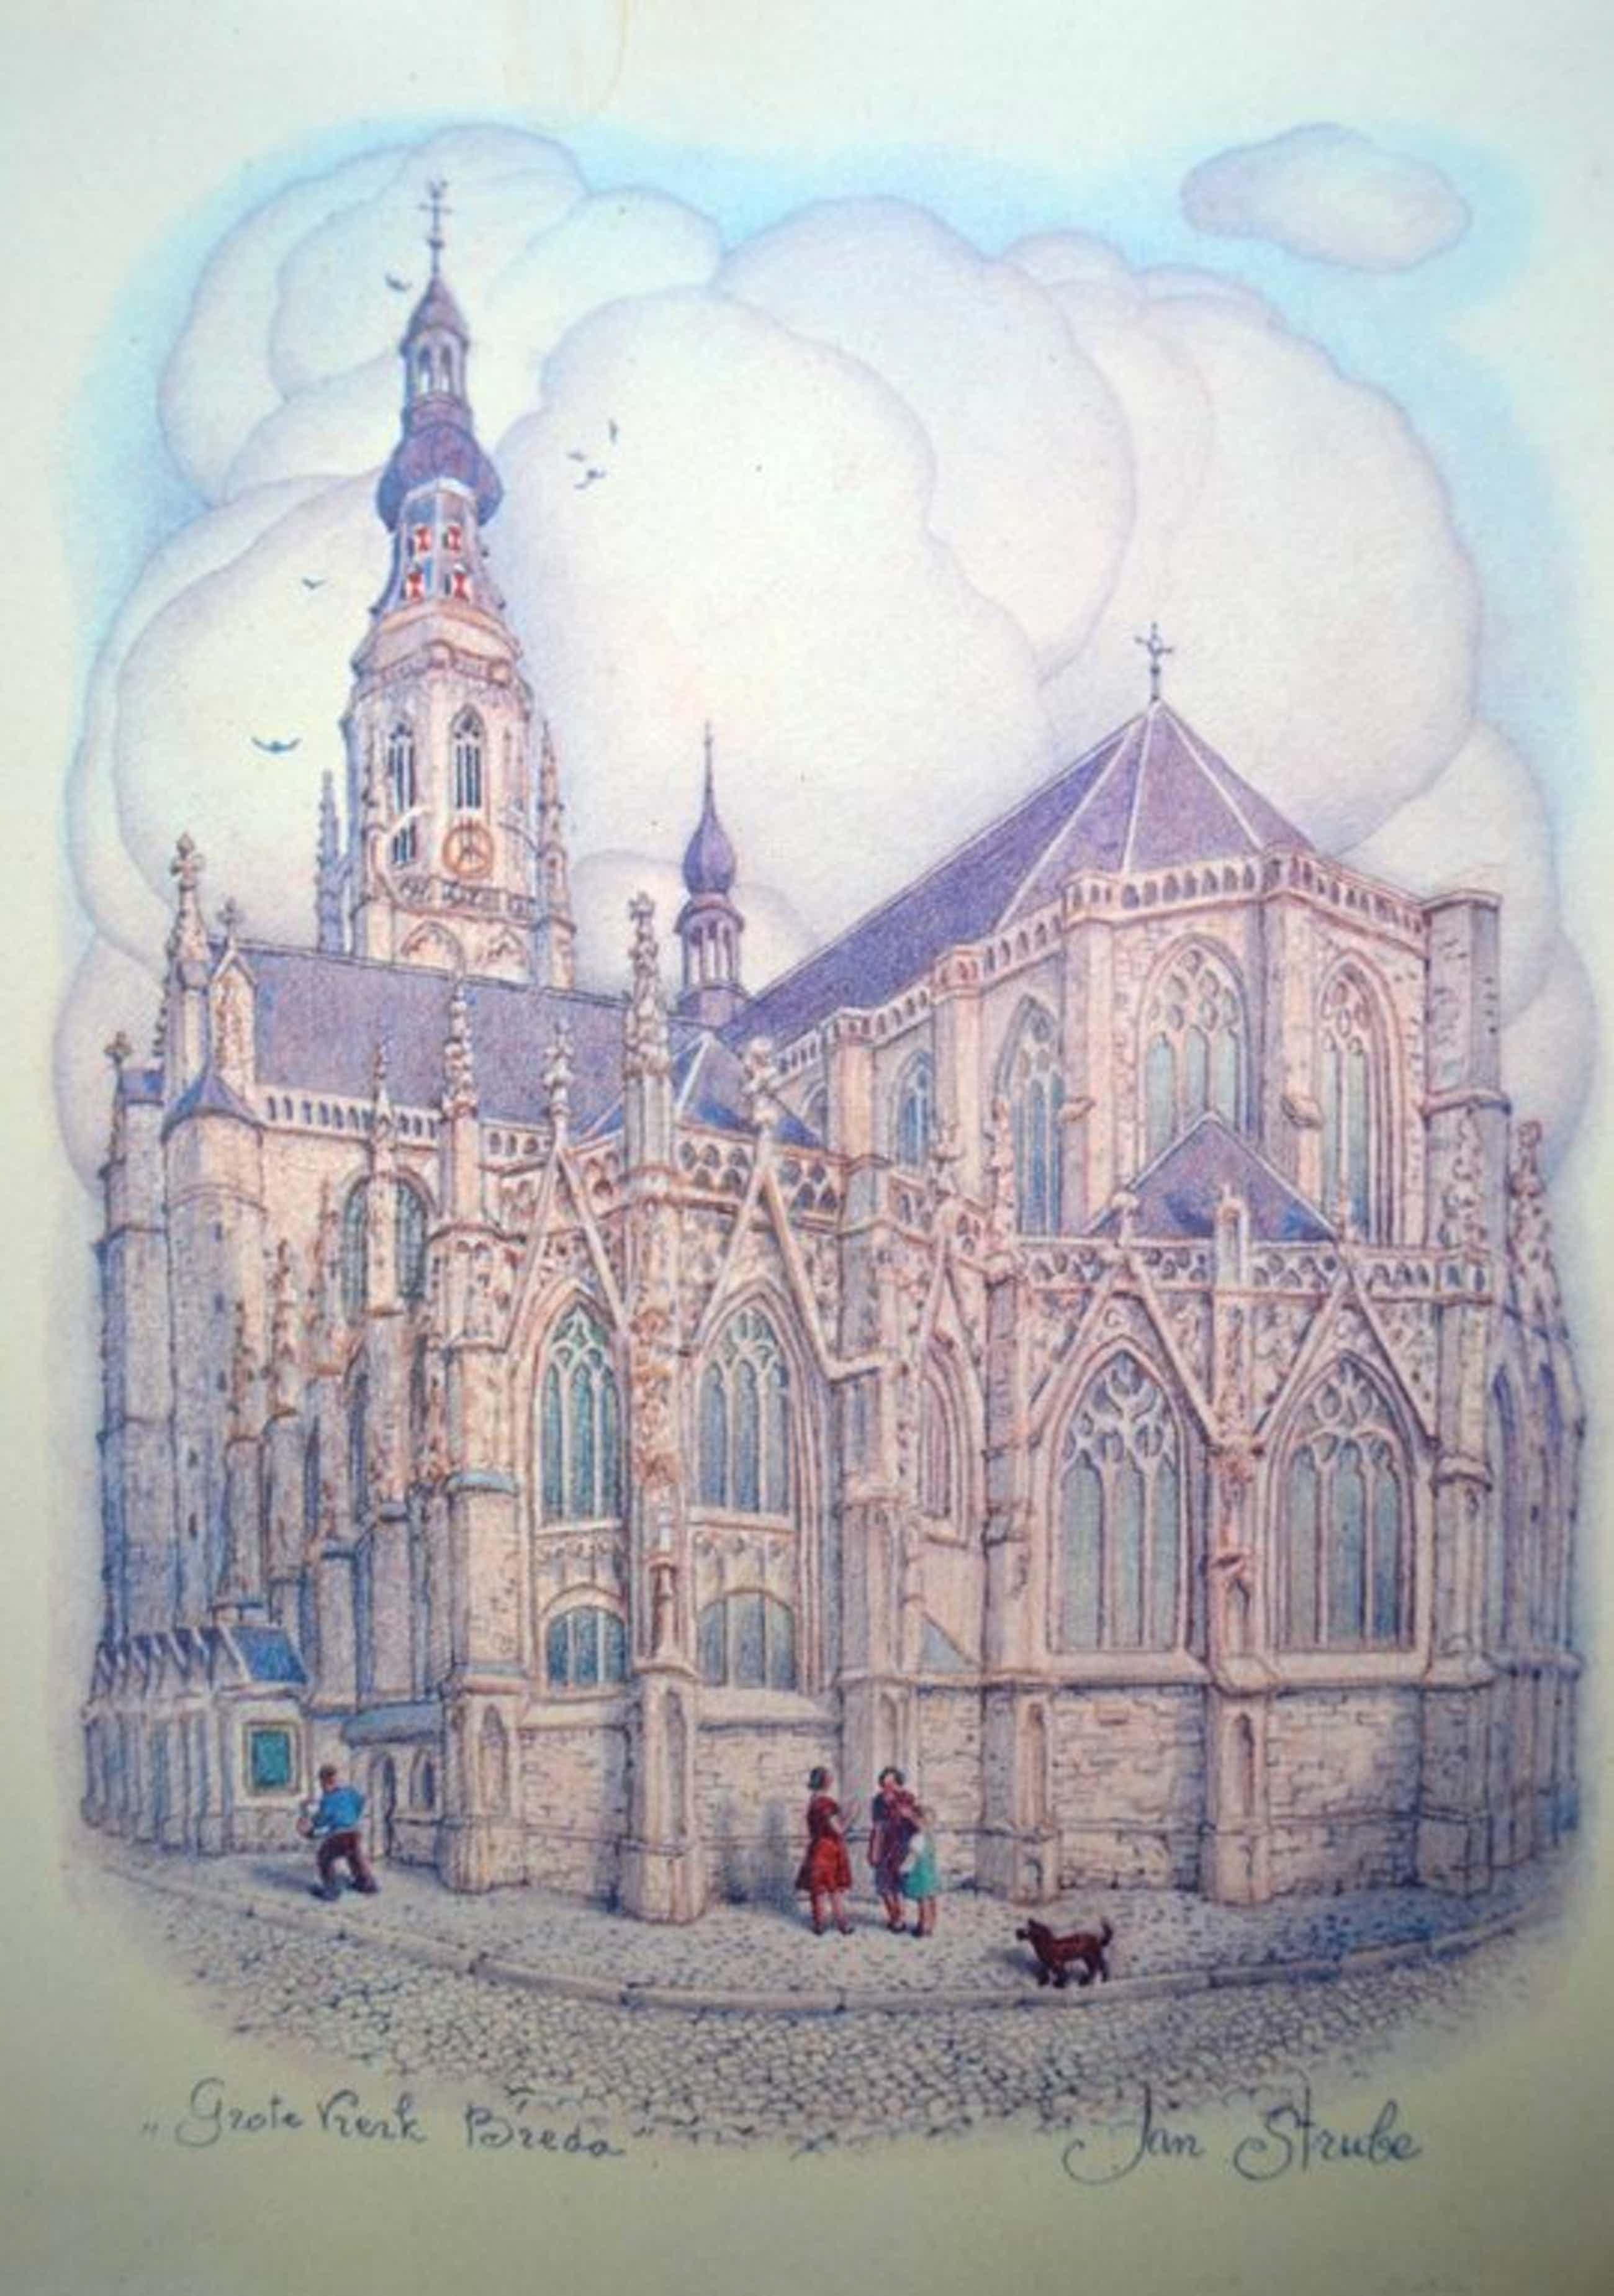 Prent van Jan Strube - Grote kerk Breda kopen? Bied vanaf 45!